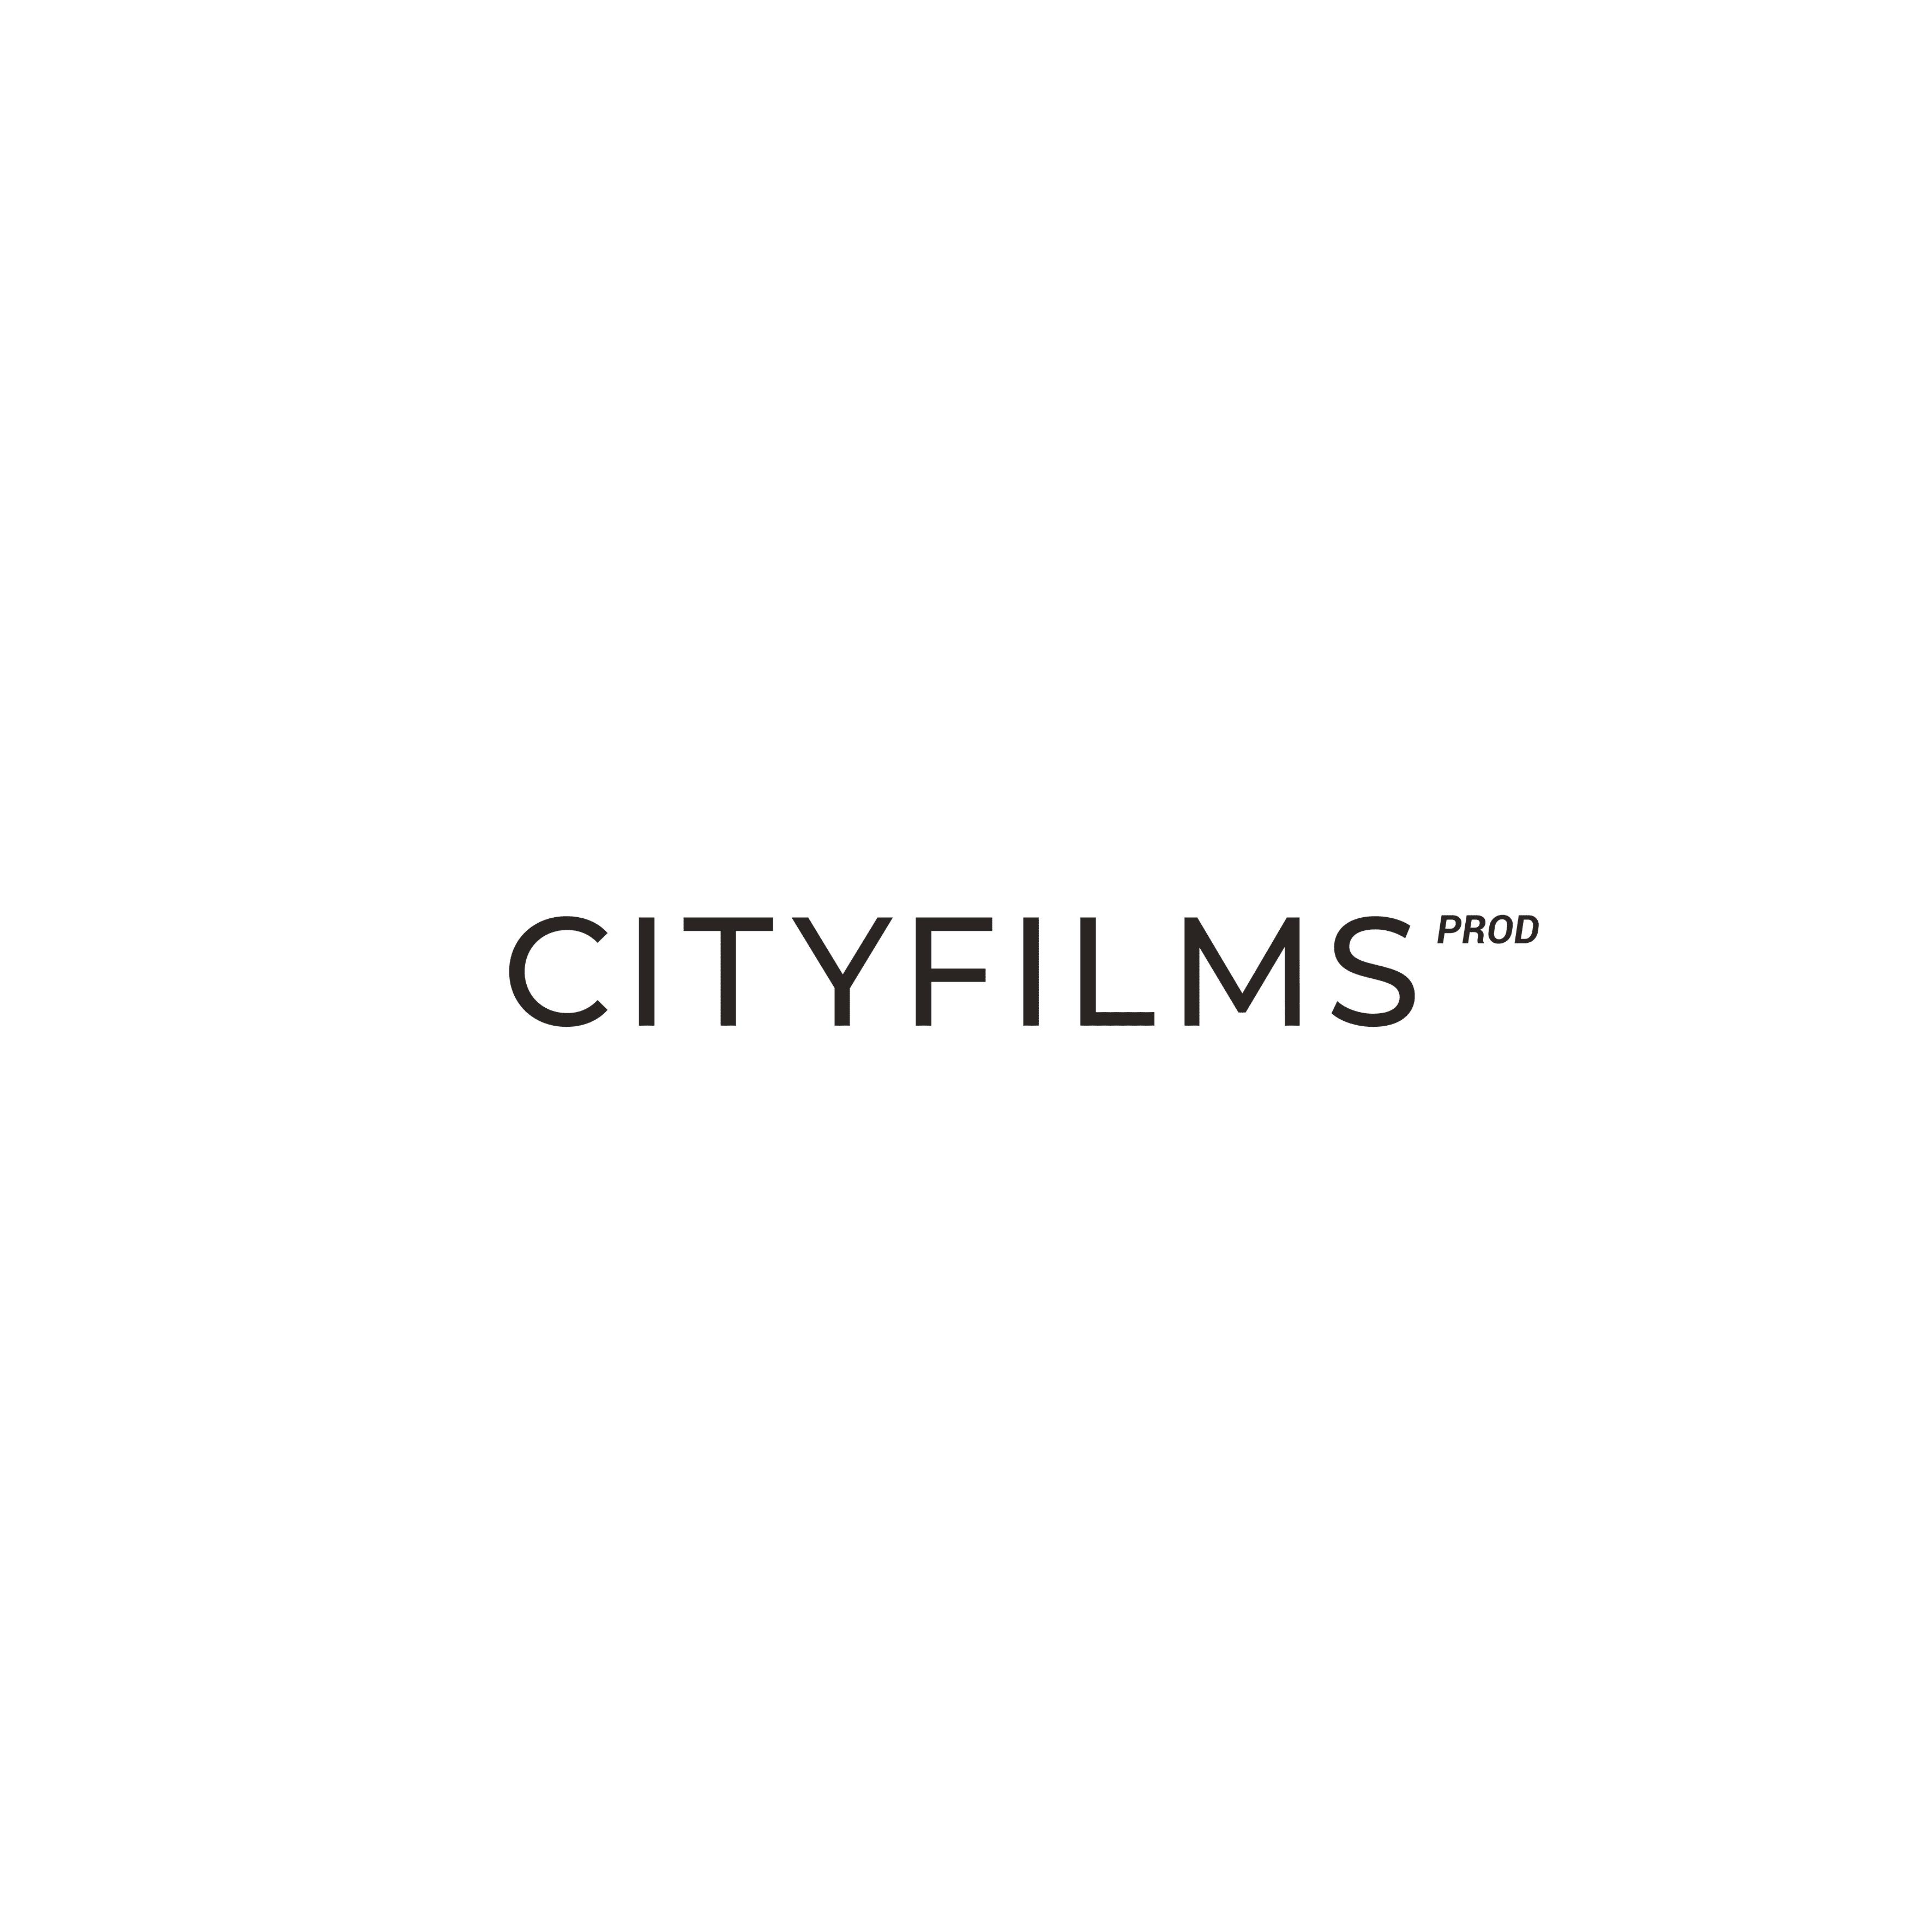 City Films